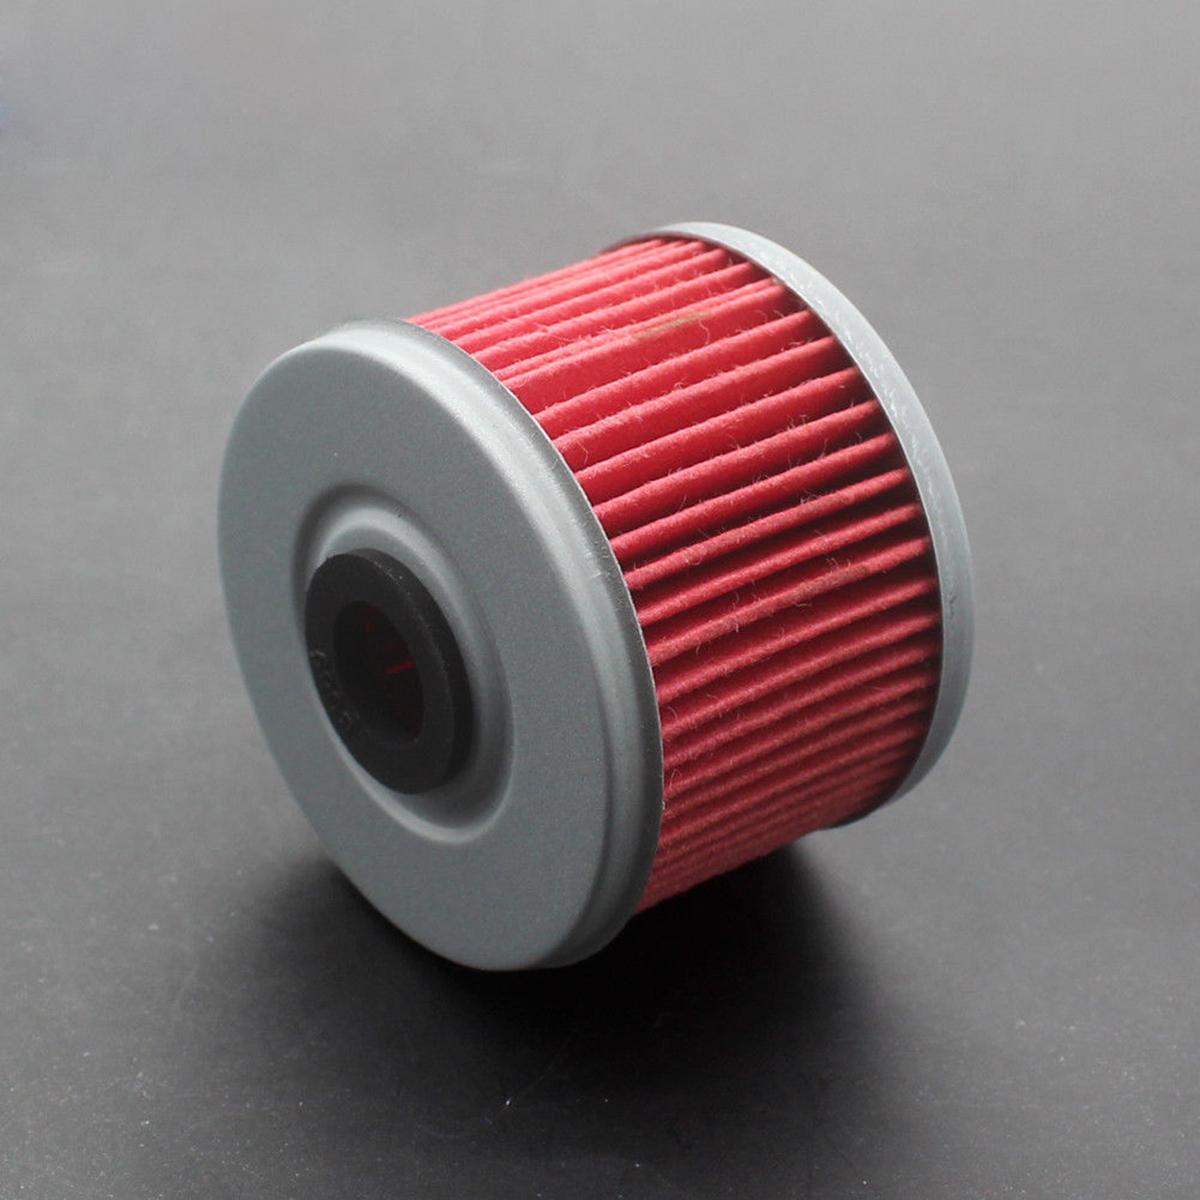 hight resolution of original 5pcs oil fuel filter for honda rancher 350 420 trx300ex 400ex fourtrax 300 foreman 500